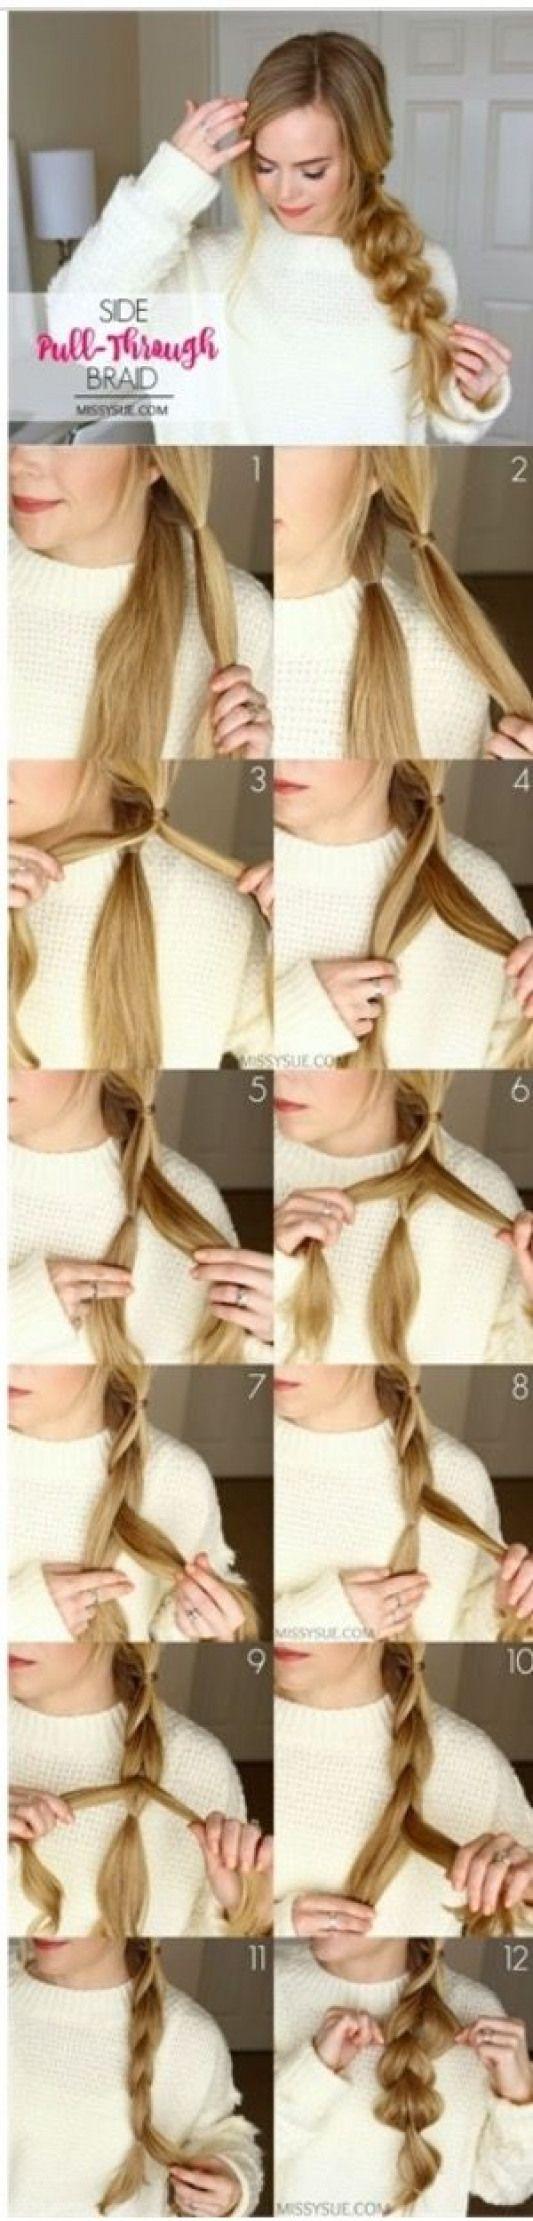 Hair tutorials #easyhairstyles #easy #hairstyles #for #wedding